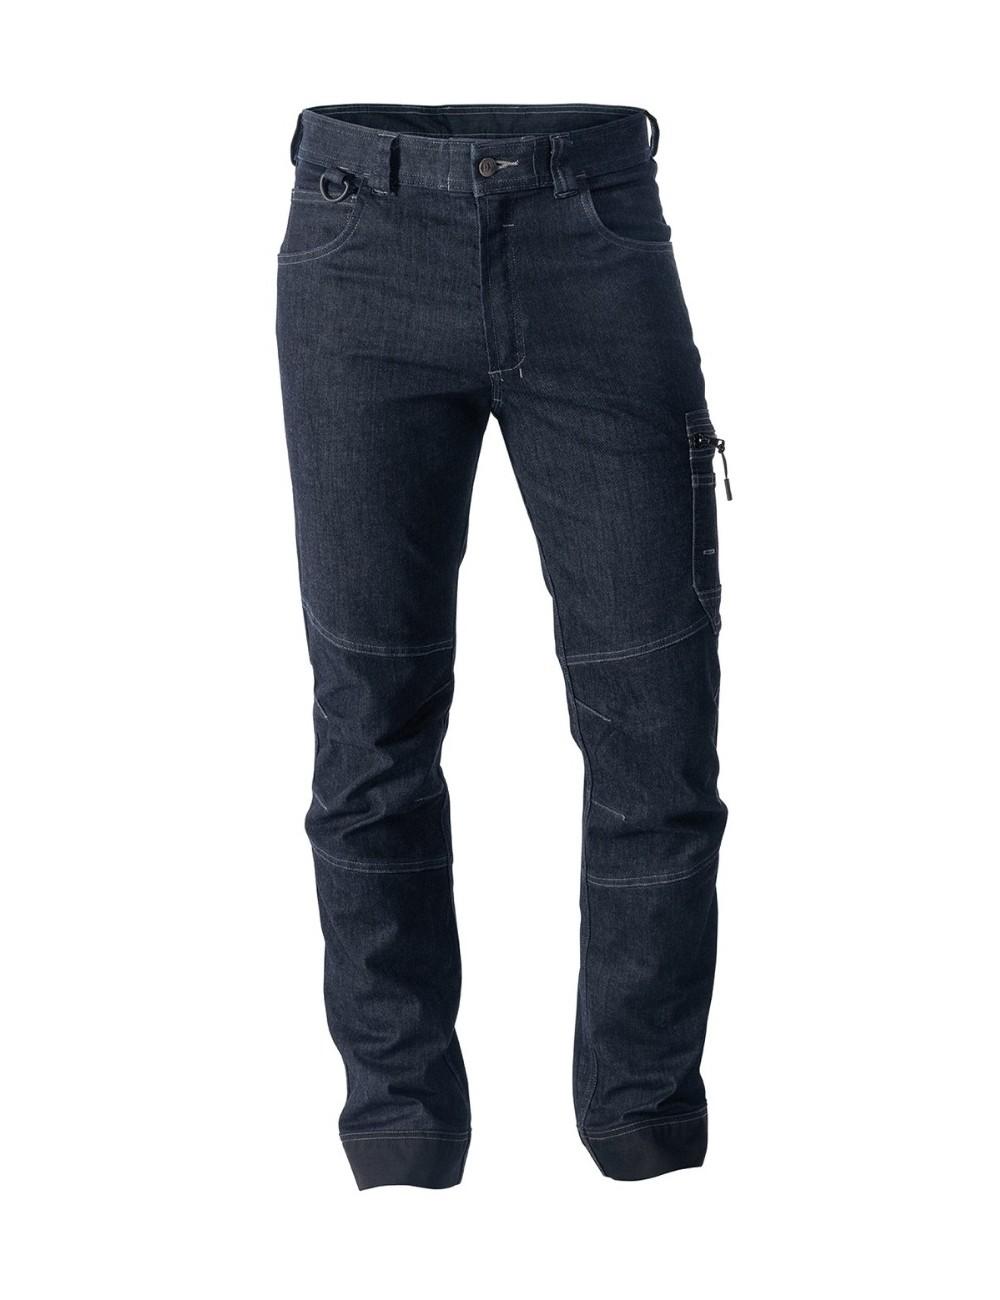 Dassy Osaka spodnie stretch